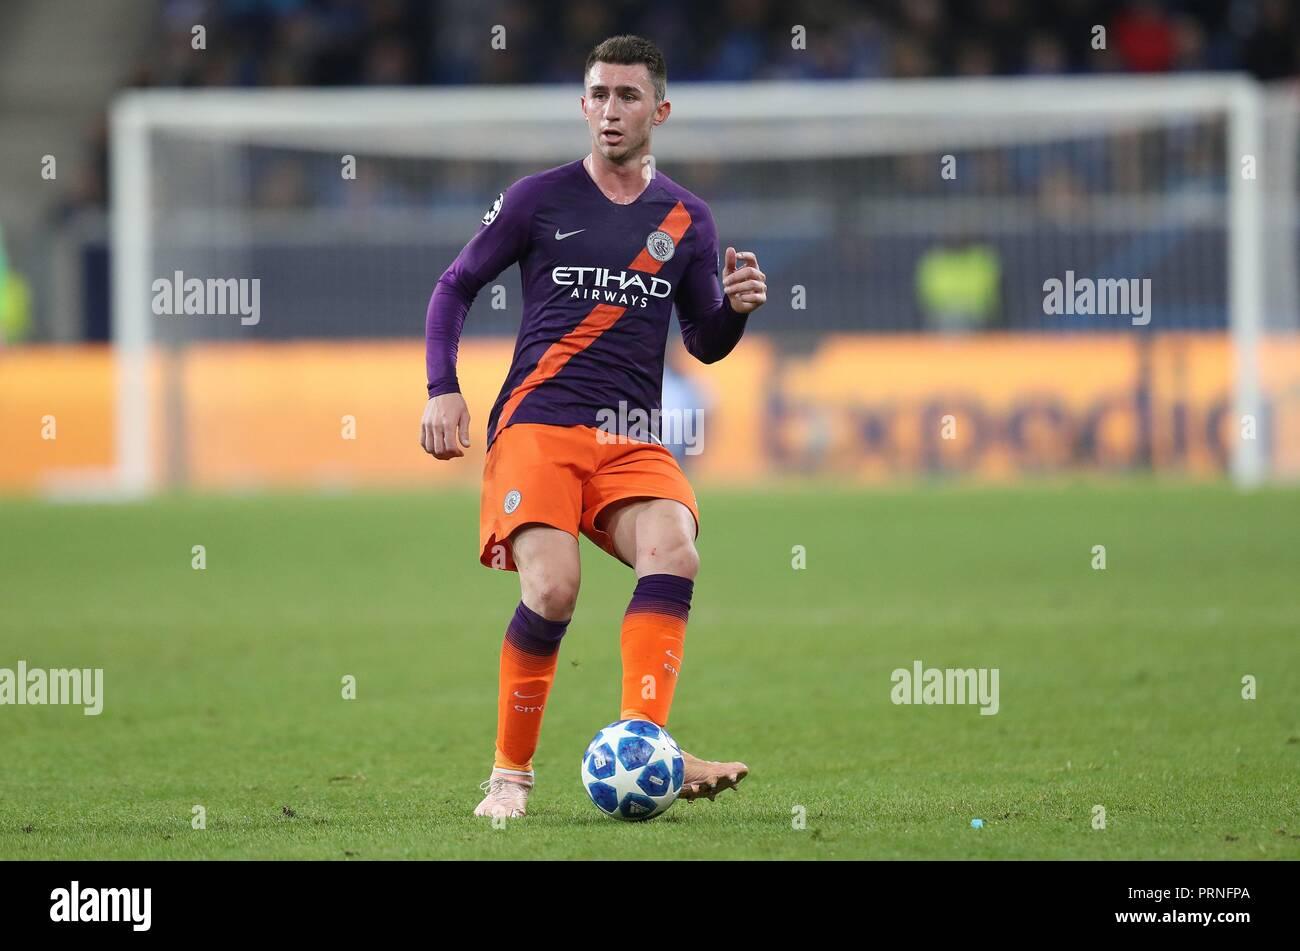 firo: 02.10.2018 Football, Football, Champions League: TSG Hoffenheim - Manchester City 1: 2 single action, Aymeric Laporte   usage worldwide - Stock Image